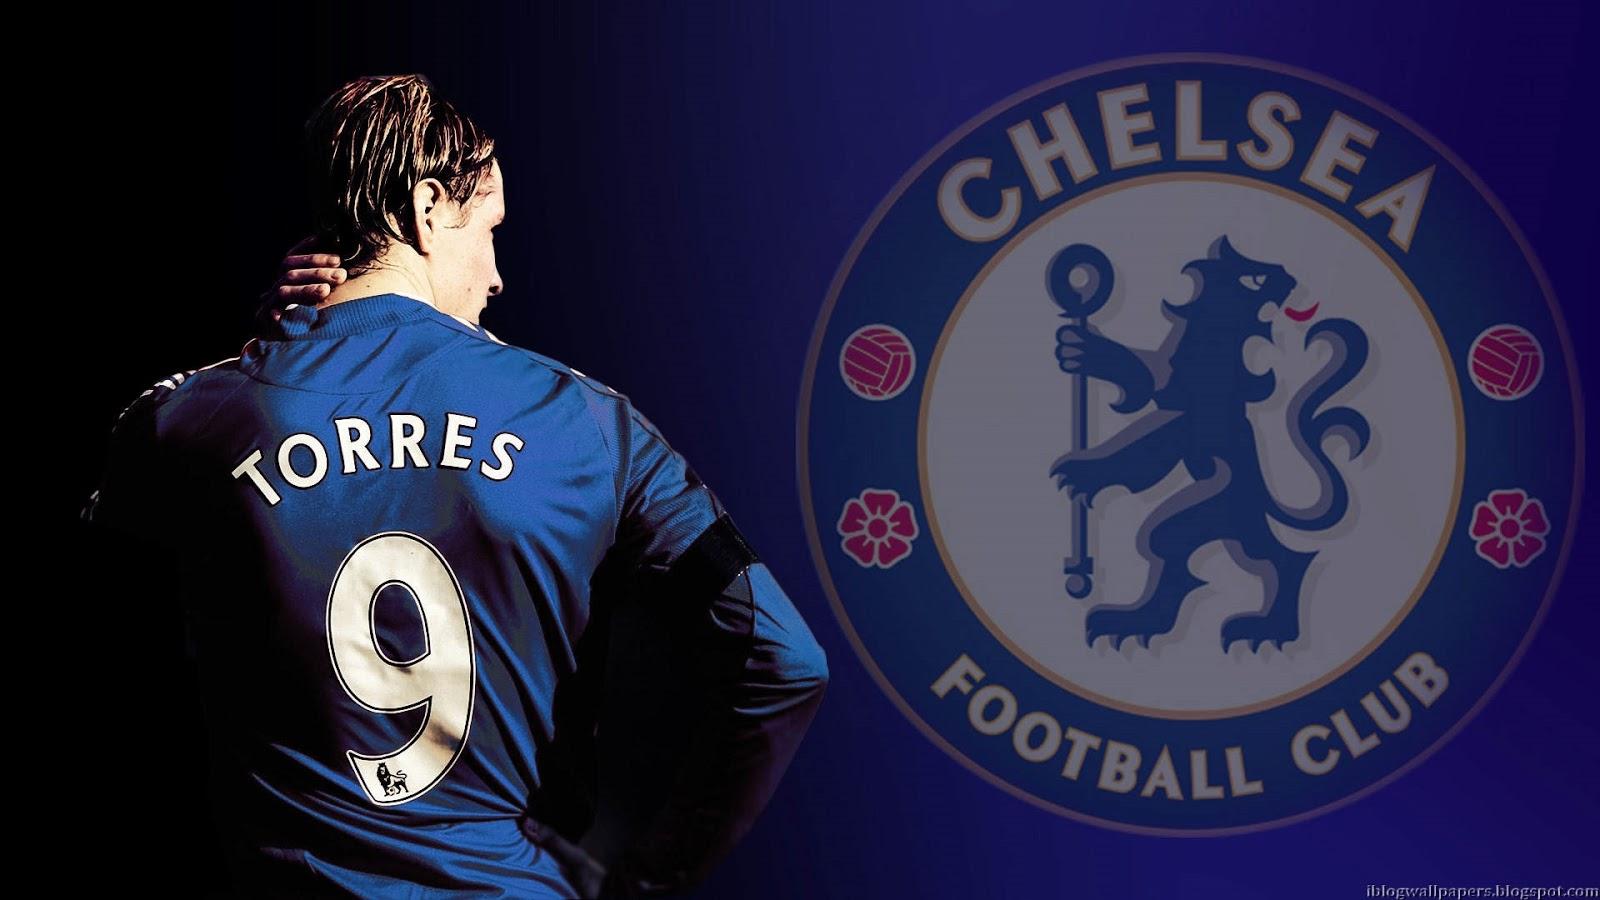 Fernando Torres Chelsea Wallpaper HD Download Wallpaper 1600x900